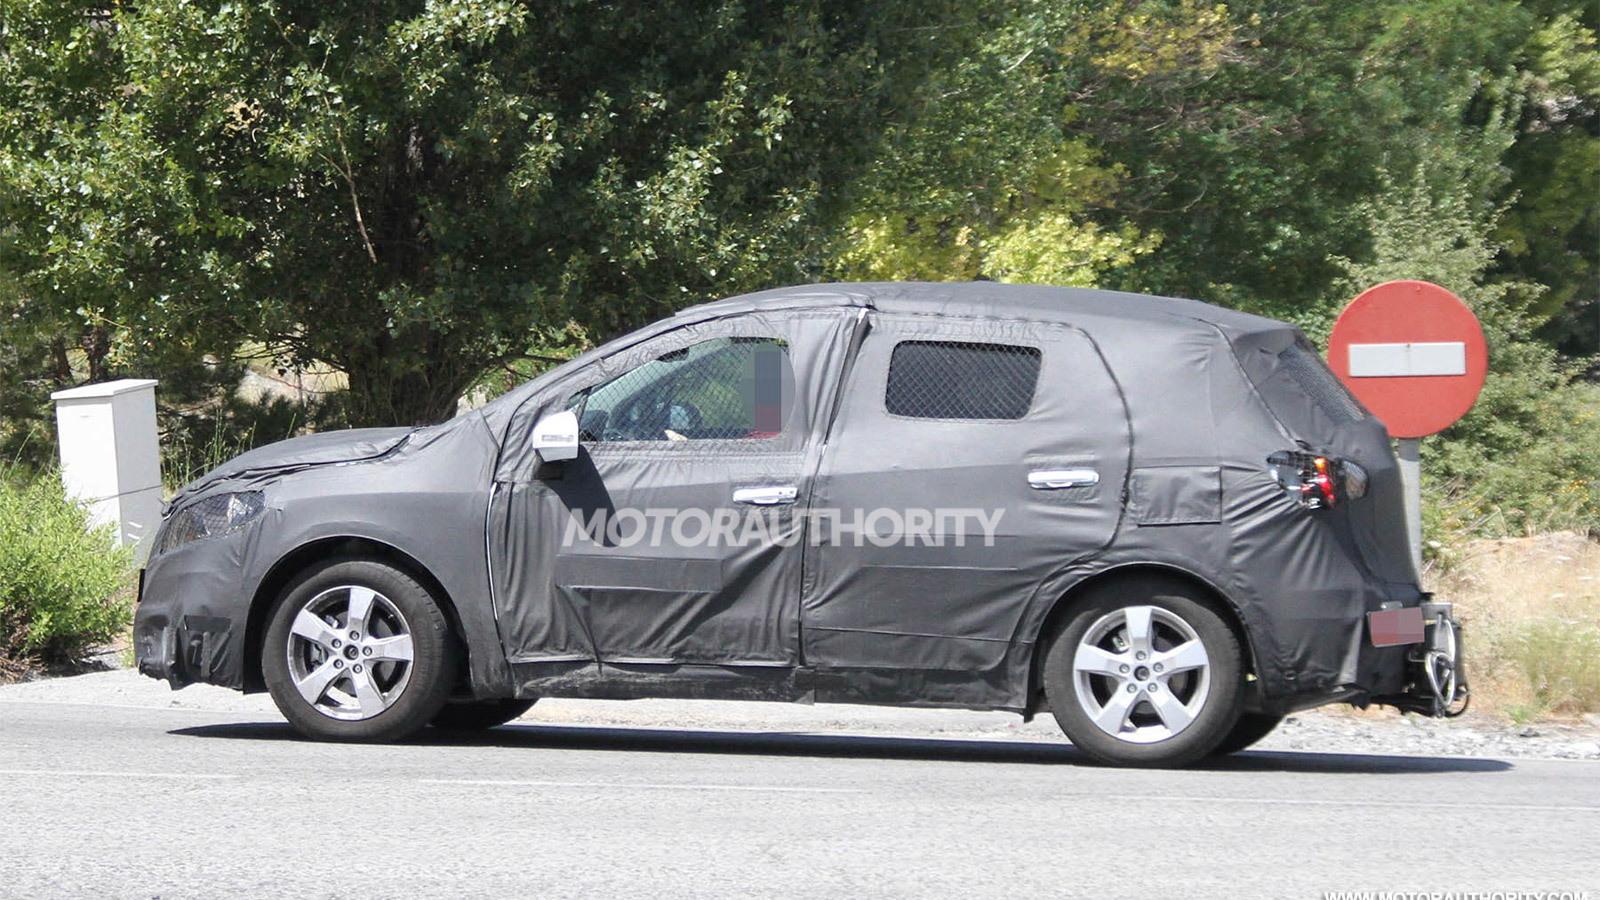 2013 Suzuki SX4 SportBack spy shots